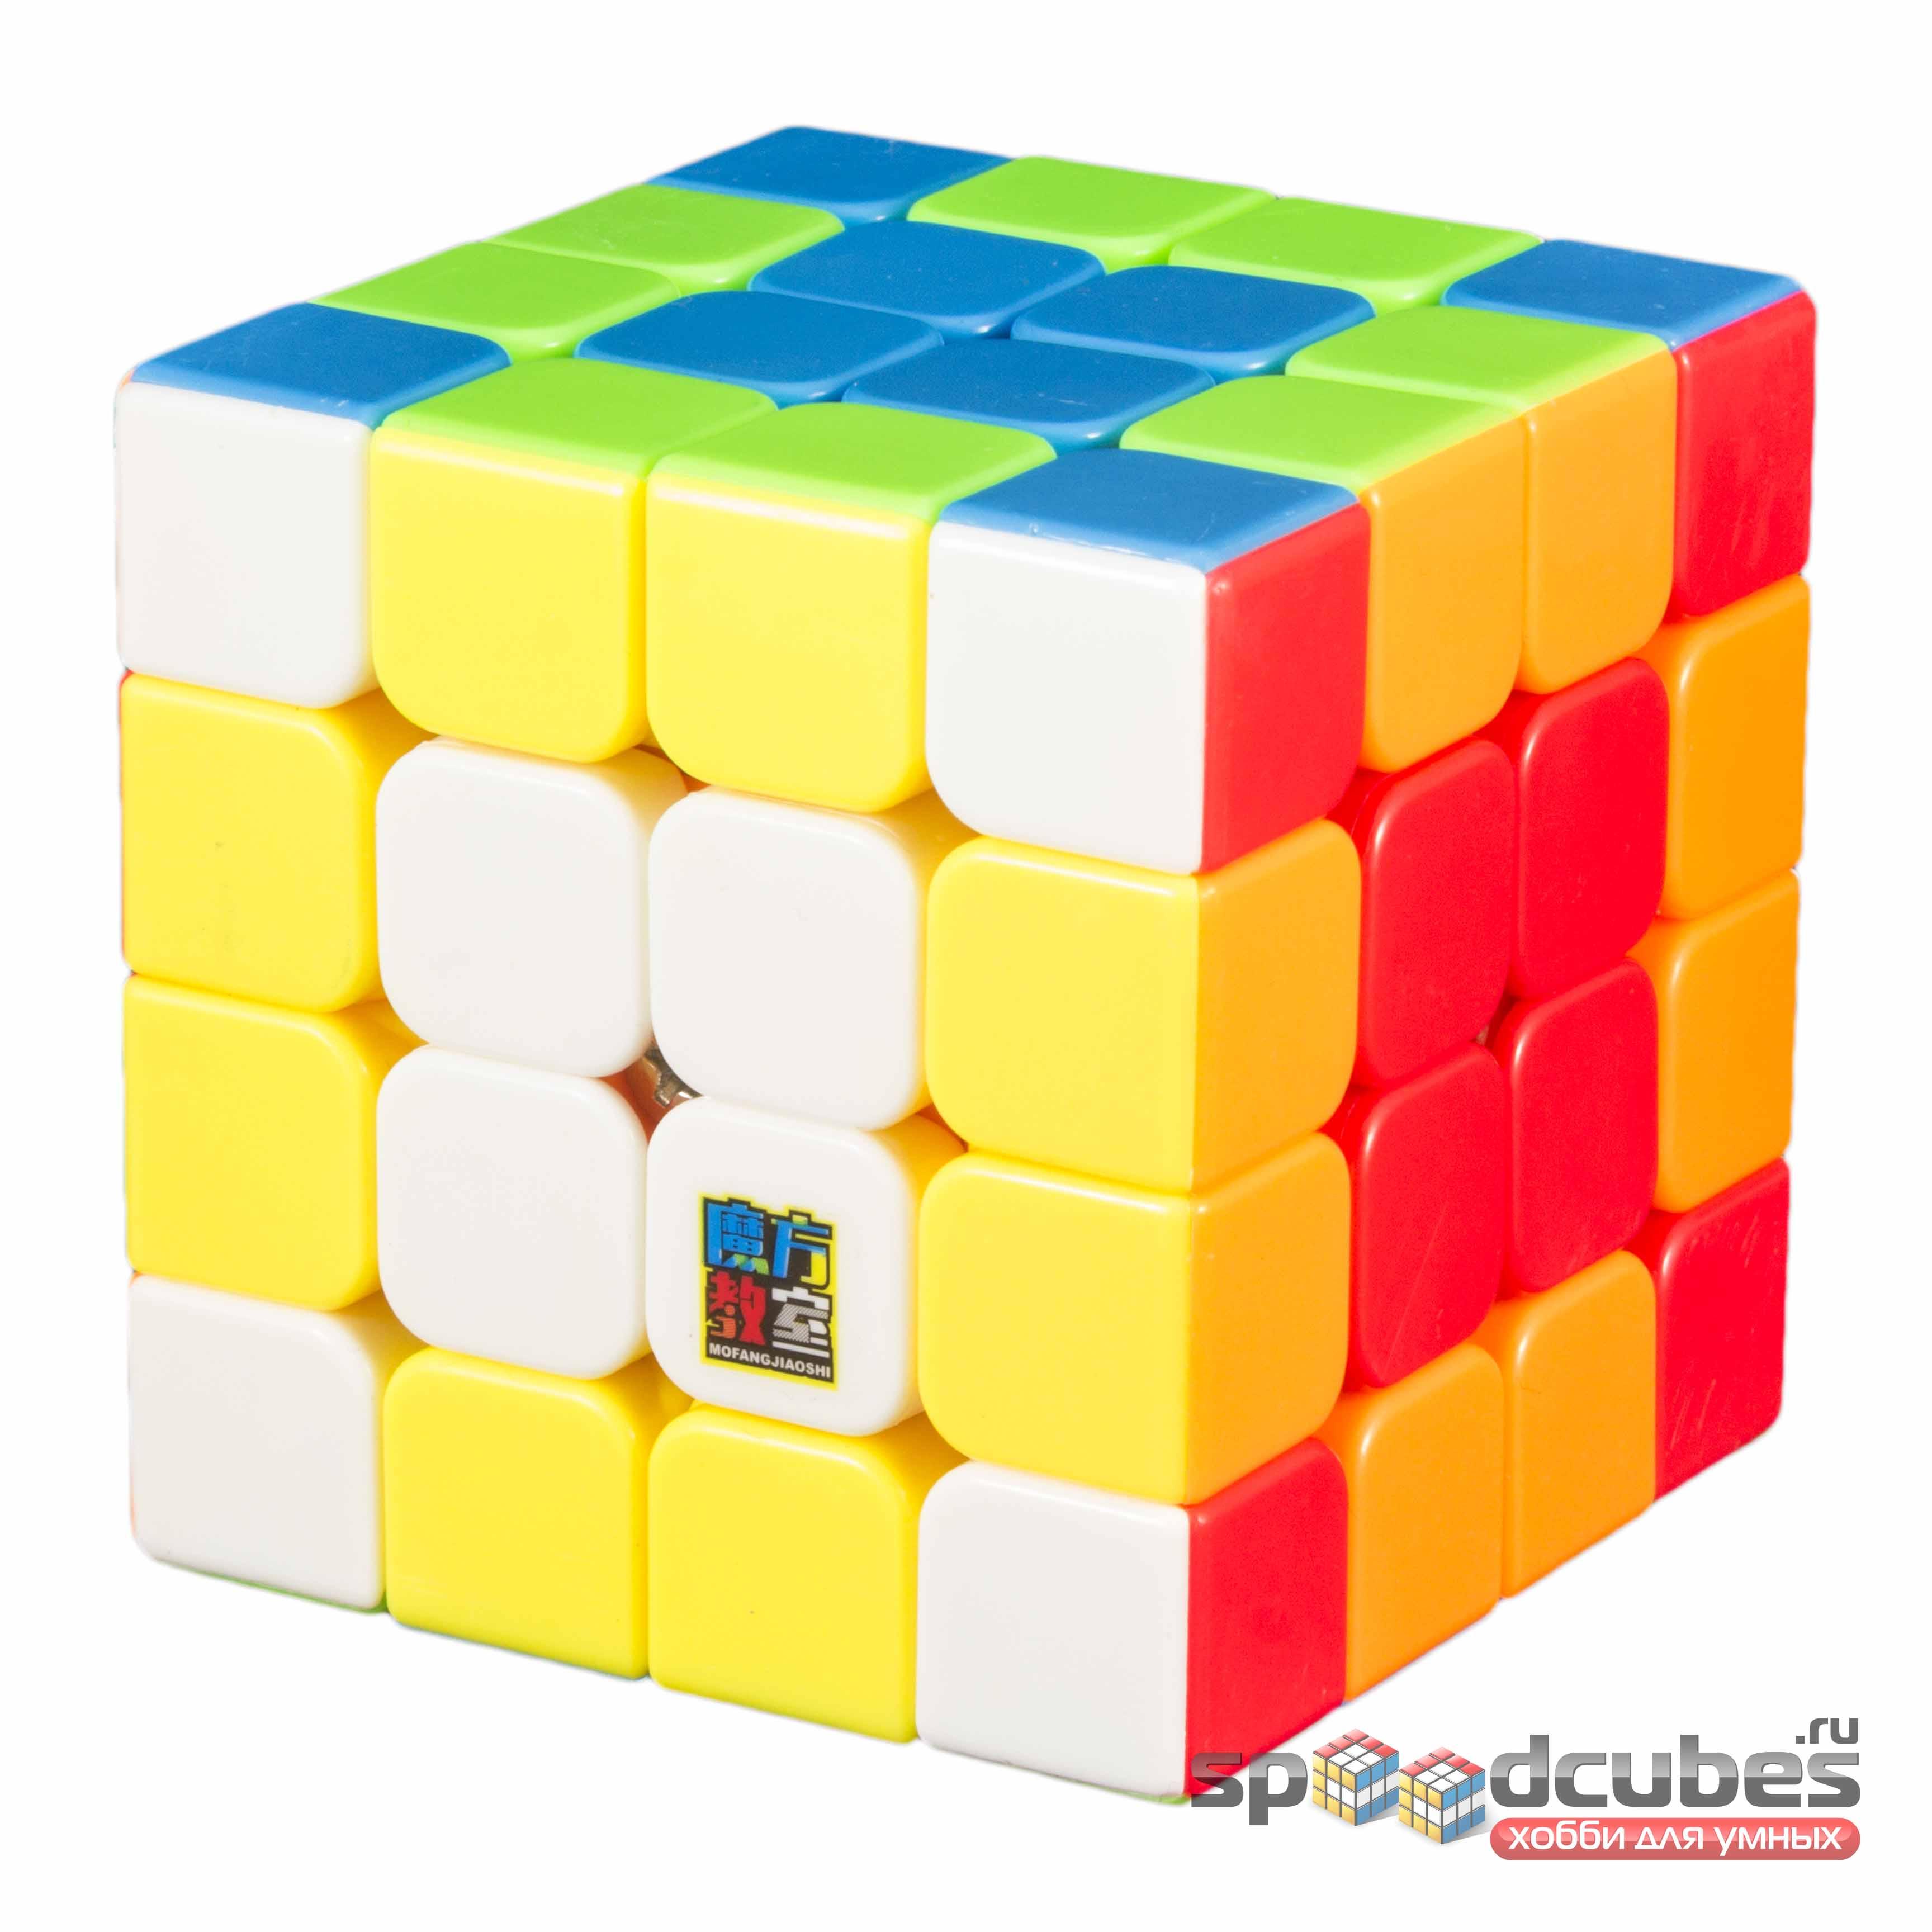 MoYu Cubing Classroom Mini (набор Moyu MF2s, MF3s, MF4s) 5